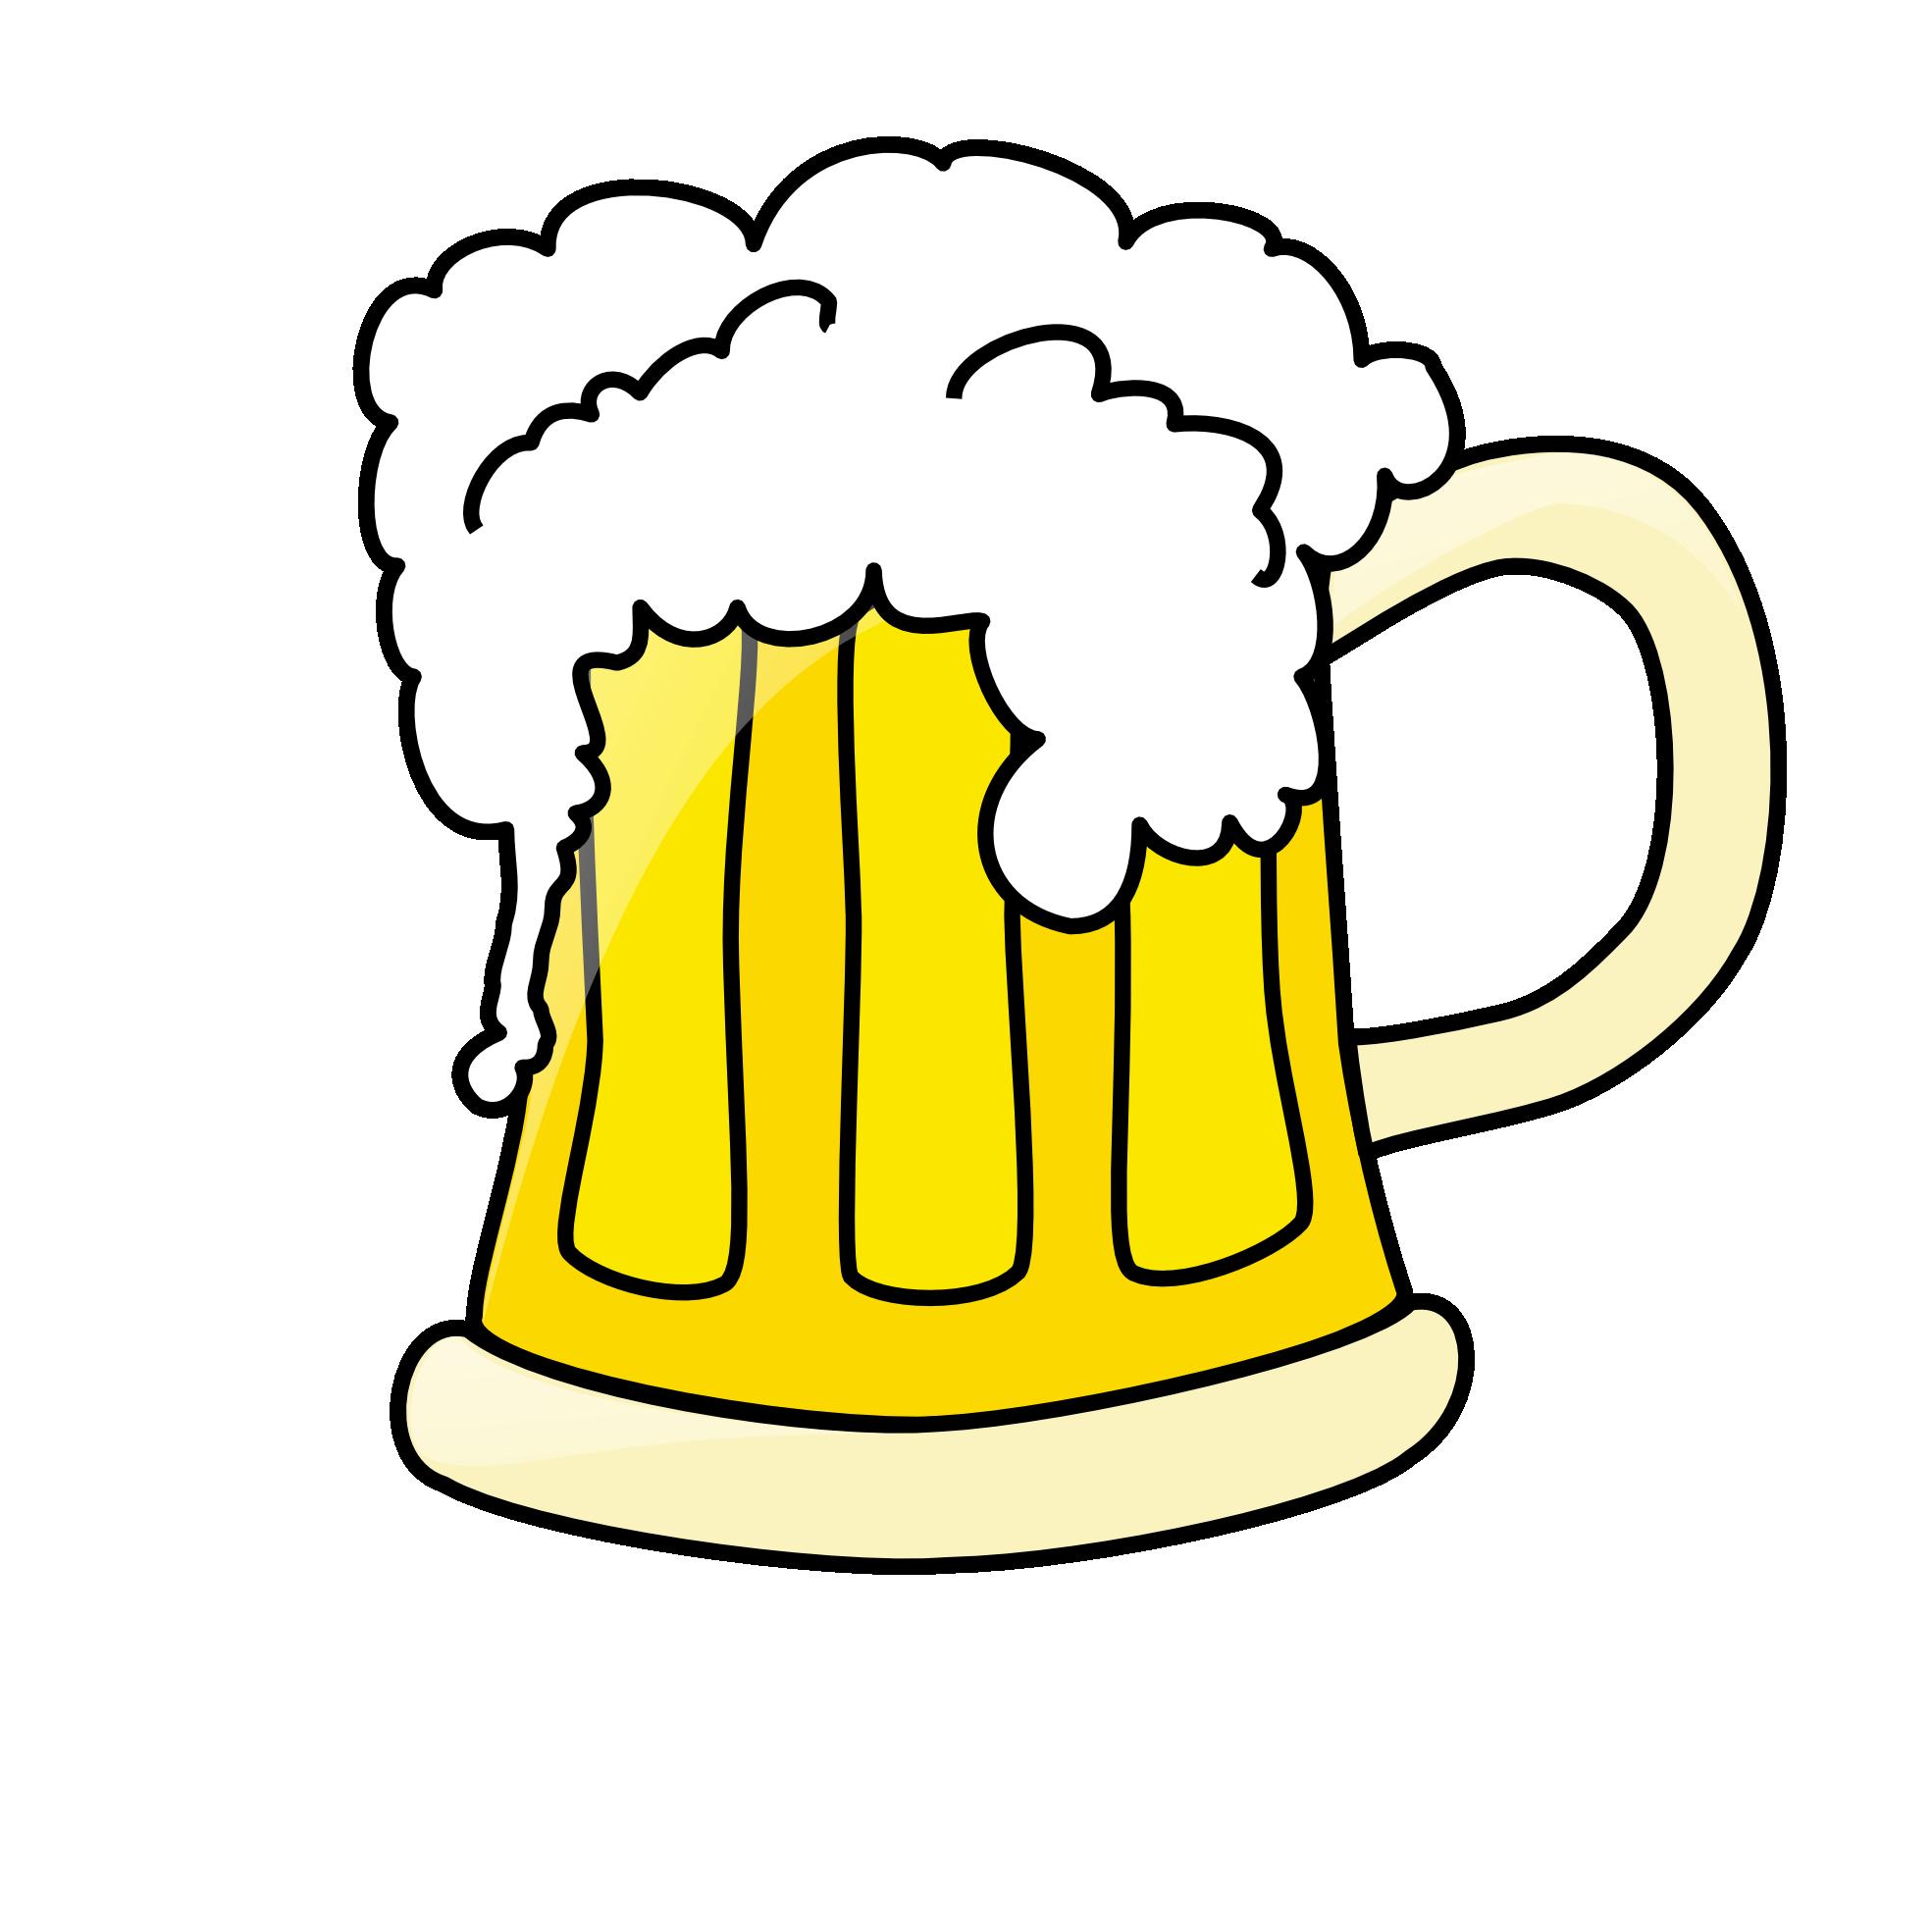 Clip Art Beer Mug Clipart beer mugs cheers clipart kid pictures of full best